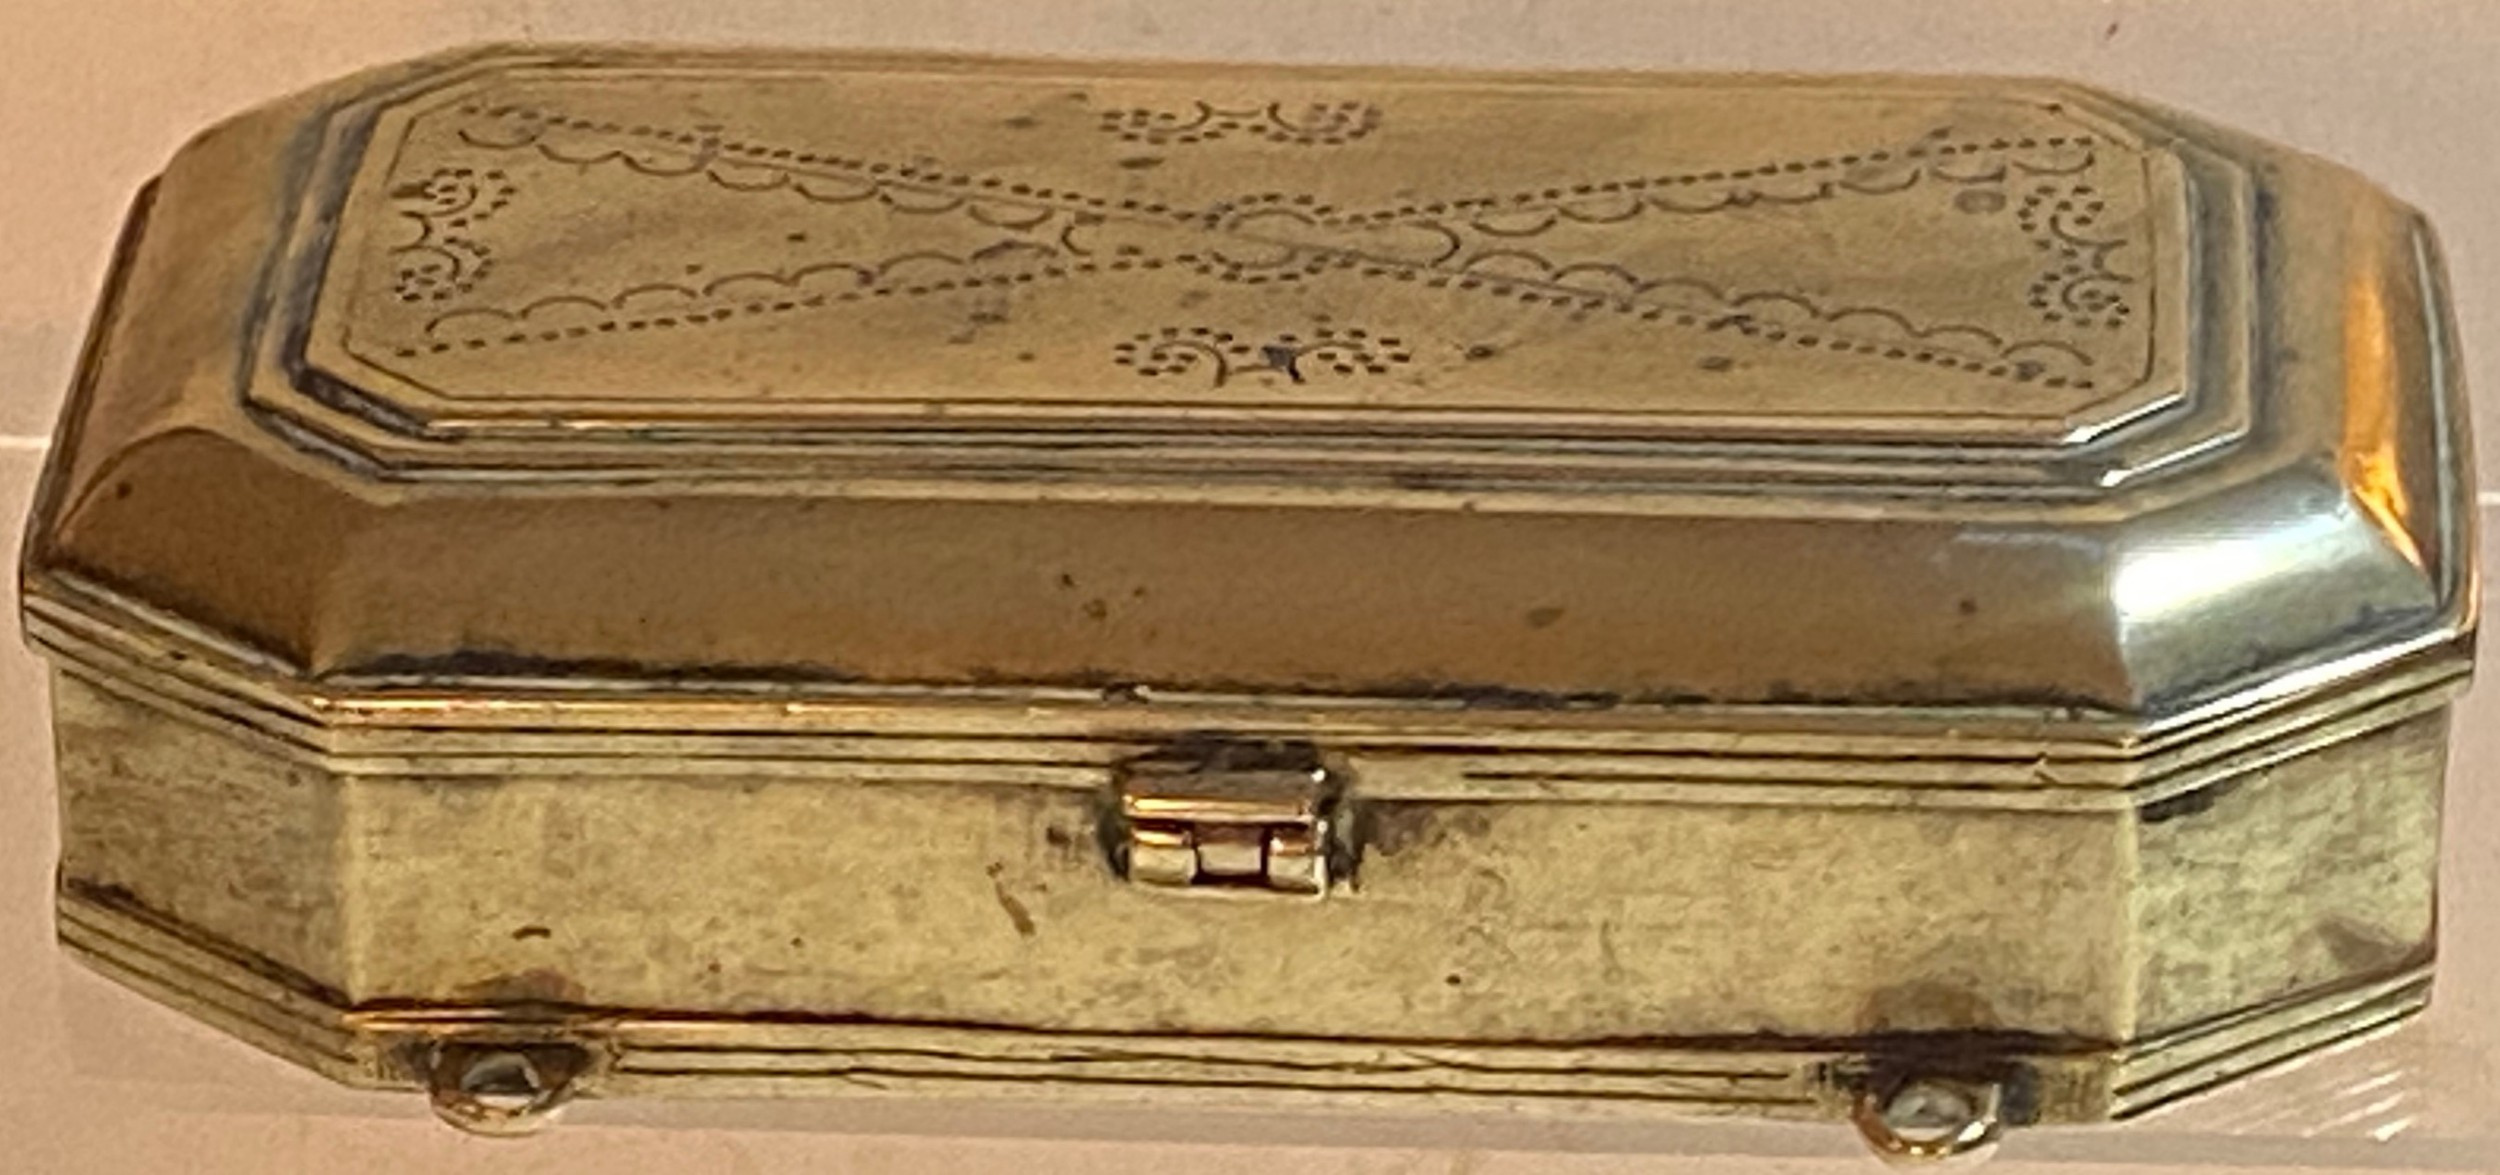 18th century brass tinder box